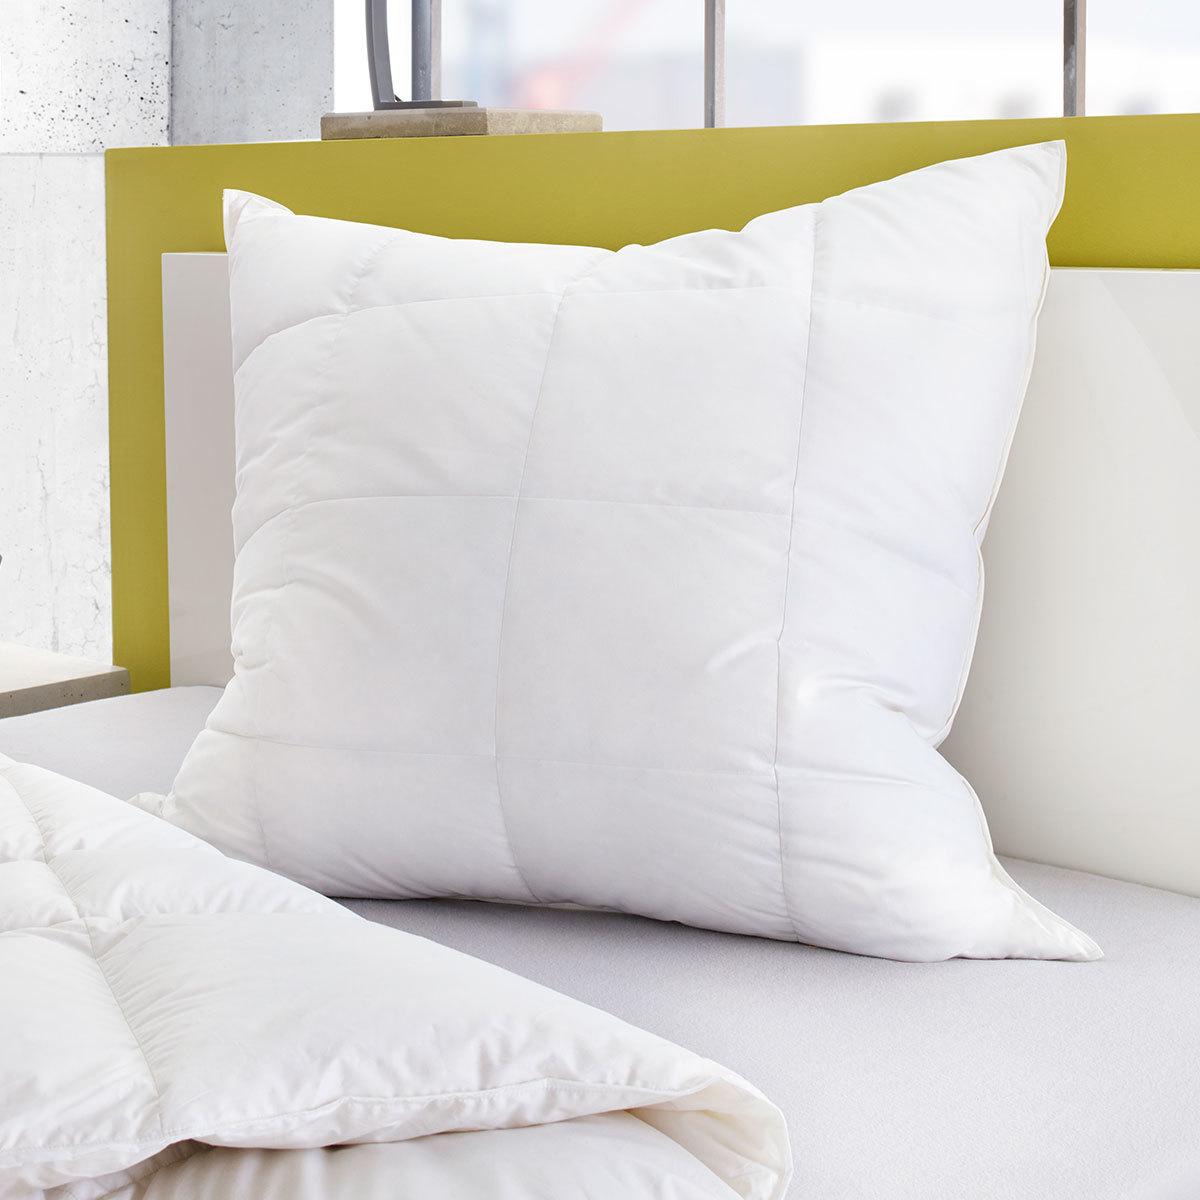 Häussling Kopfkissen Select multi sleep soft